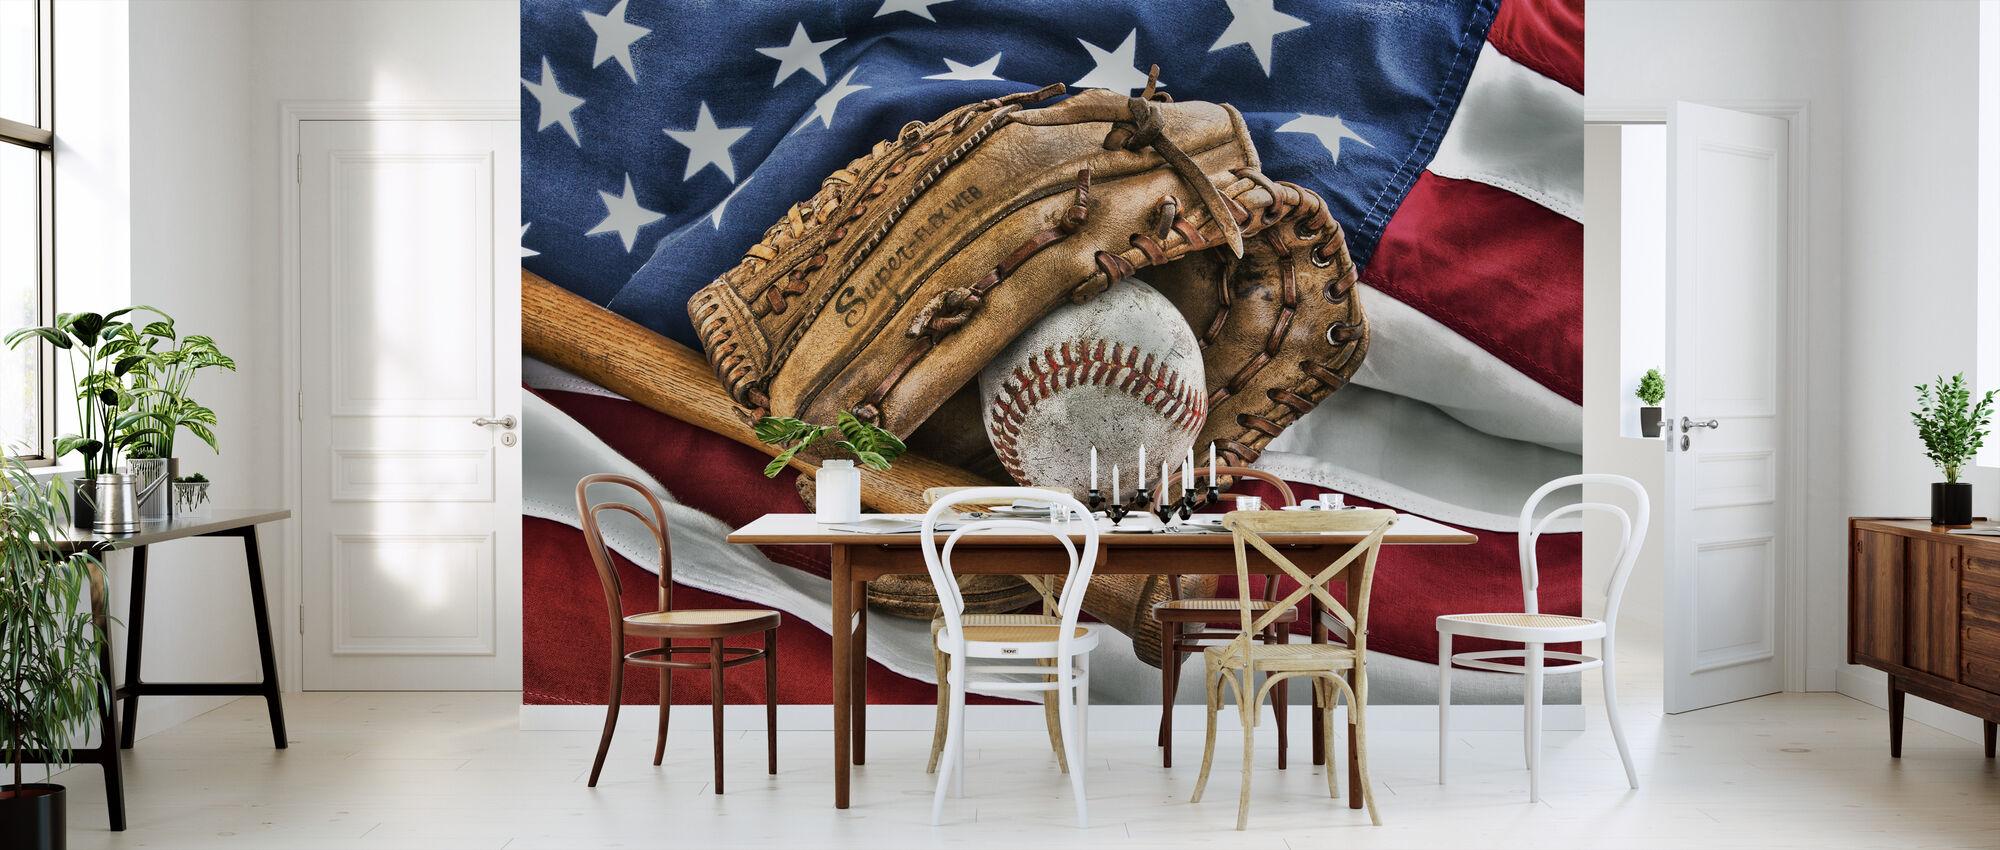 vintage baseball glove preiswerte fototapete photowall. Black Bedroom Furniture Sets. Home Design Ideas